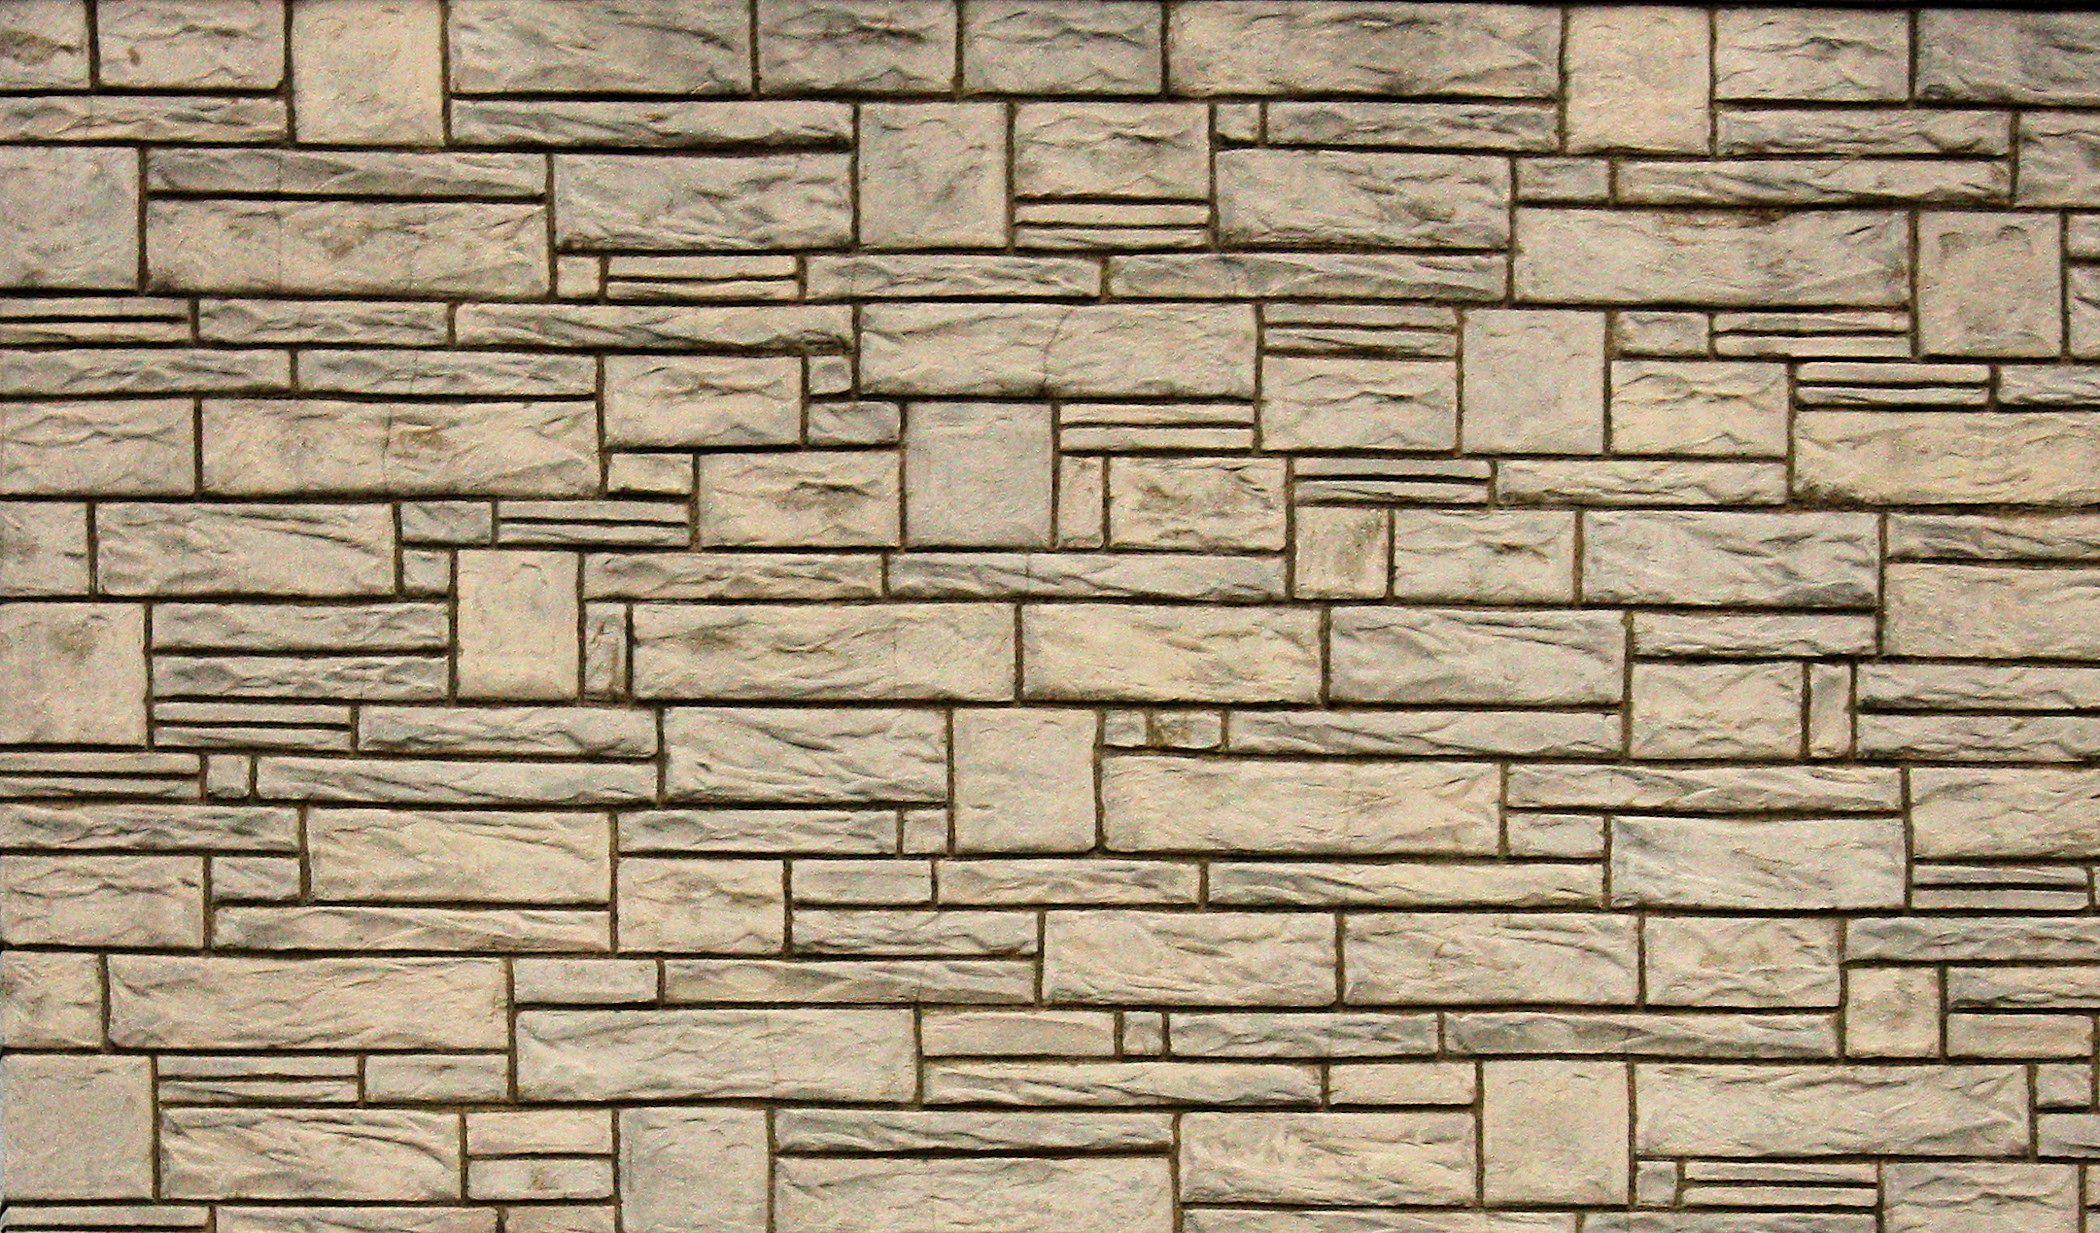 Stone Wallpaper Google Search Stone Wallpaper Faux Brick Wallpaper 3d Stone Wallpaper